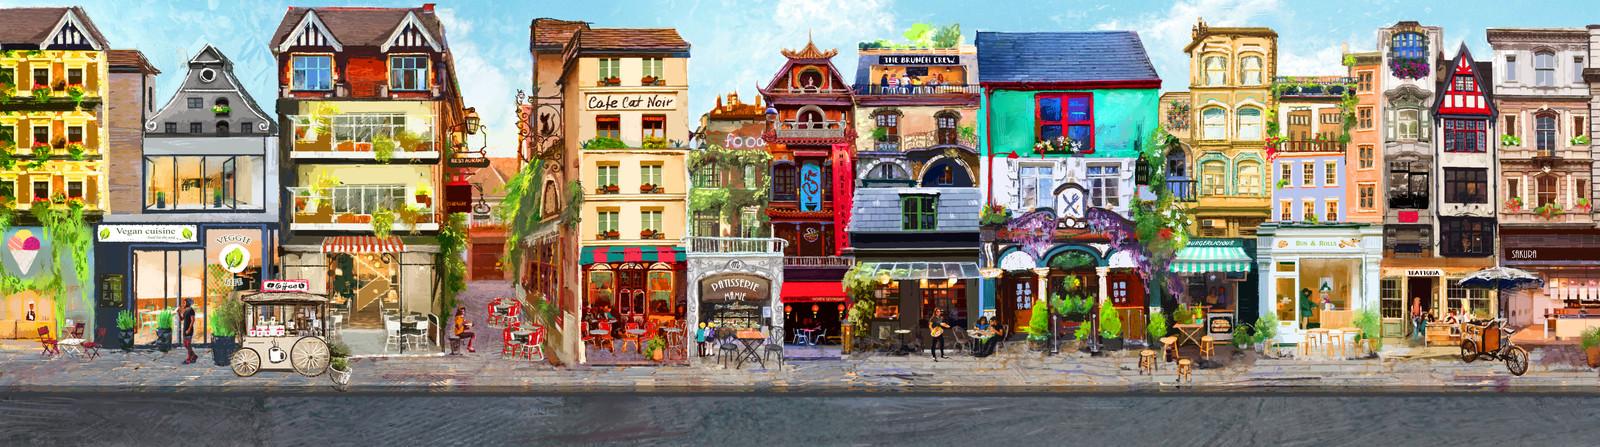 Restaurants street